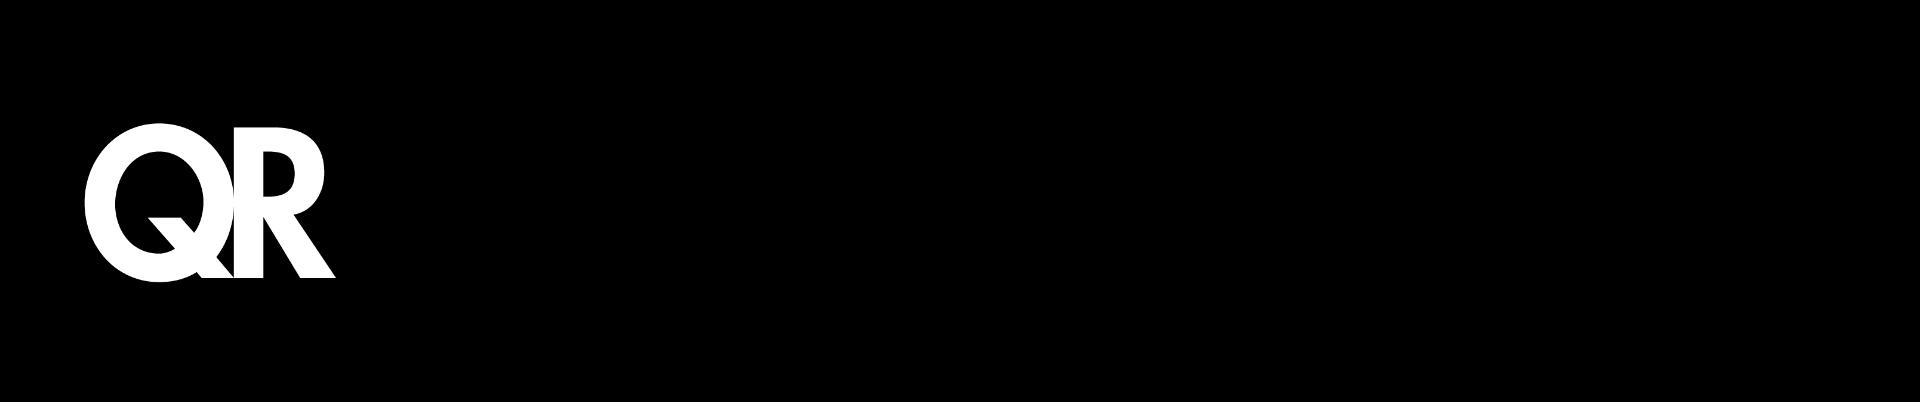 Predator QR2 extension logo